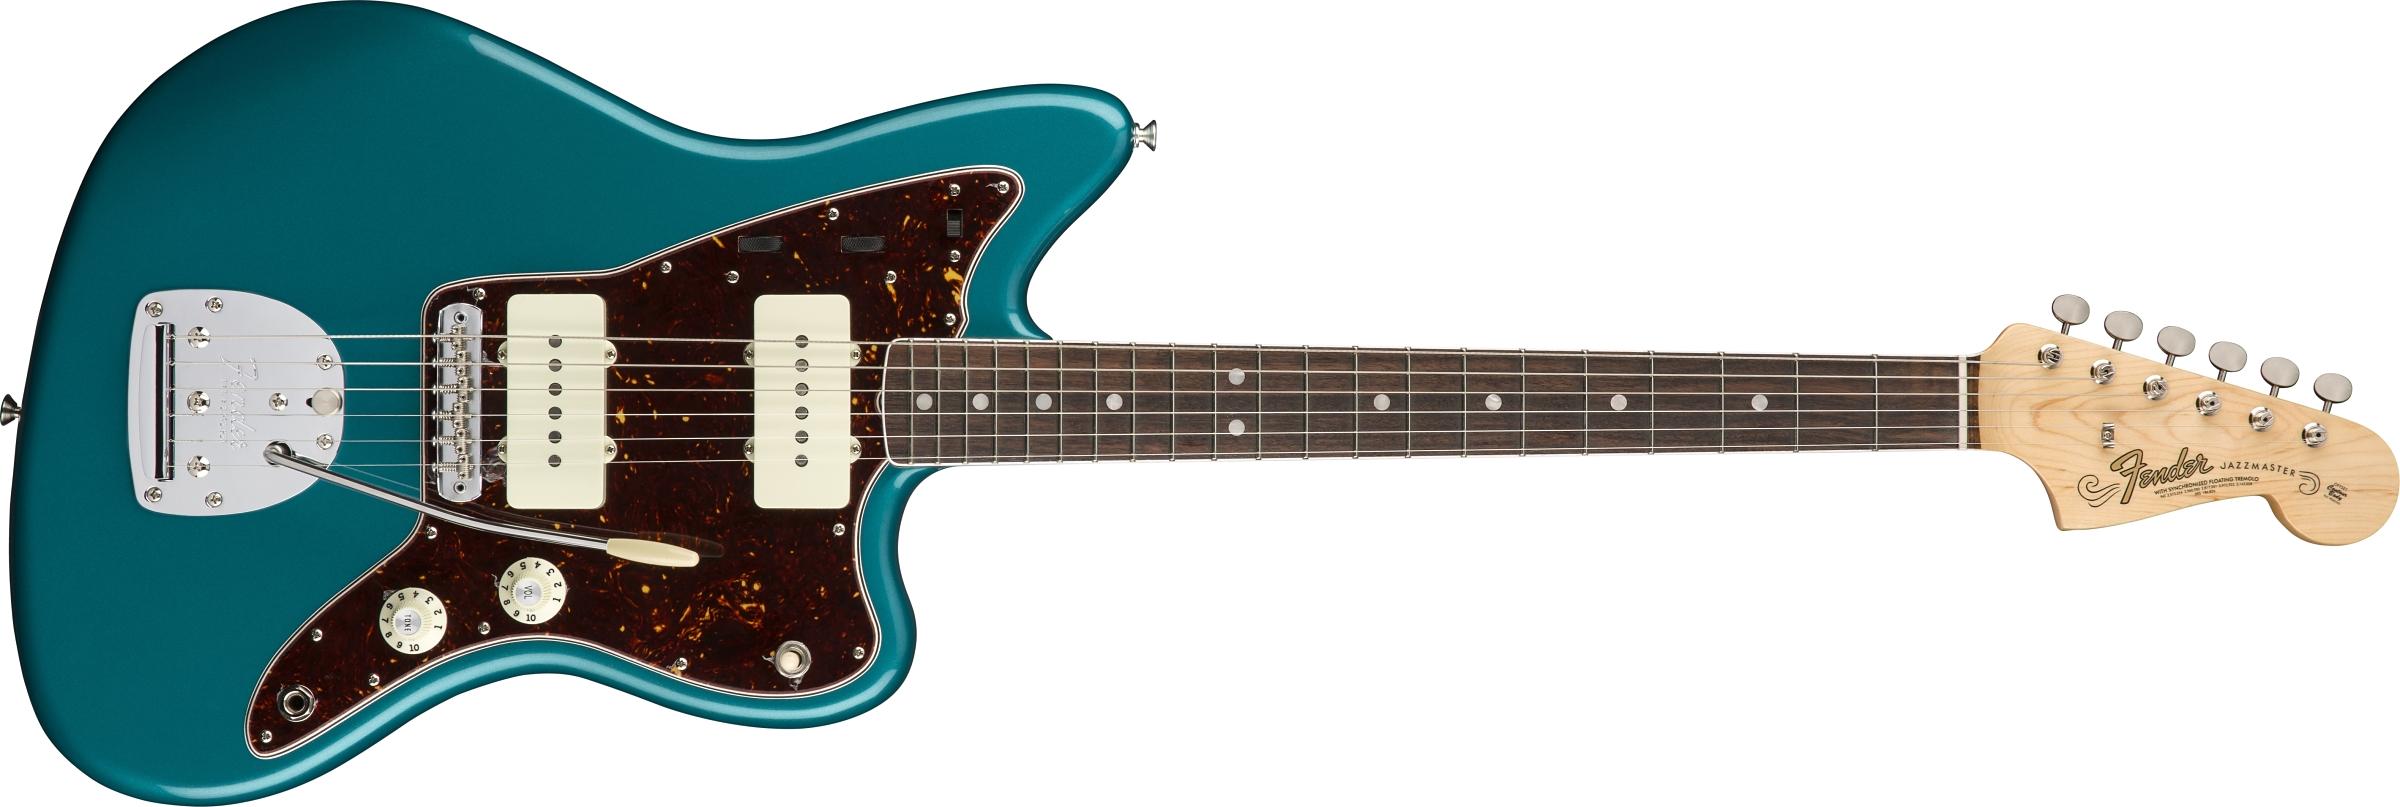 american original 39 60s jazzmaster electric guitars. Black Bedroom Furniture Sets. Home Design Ideas